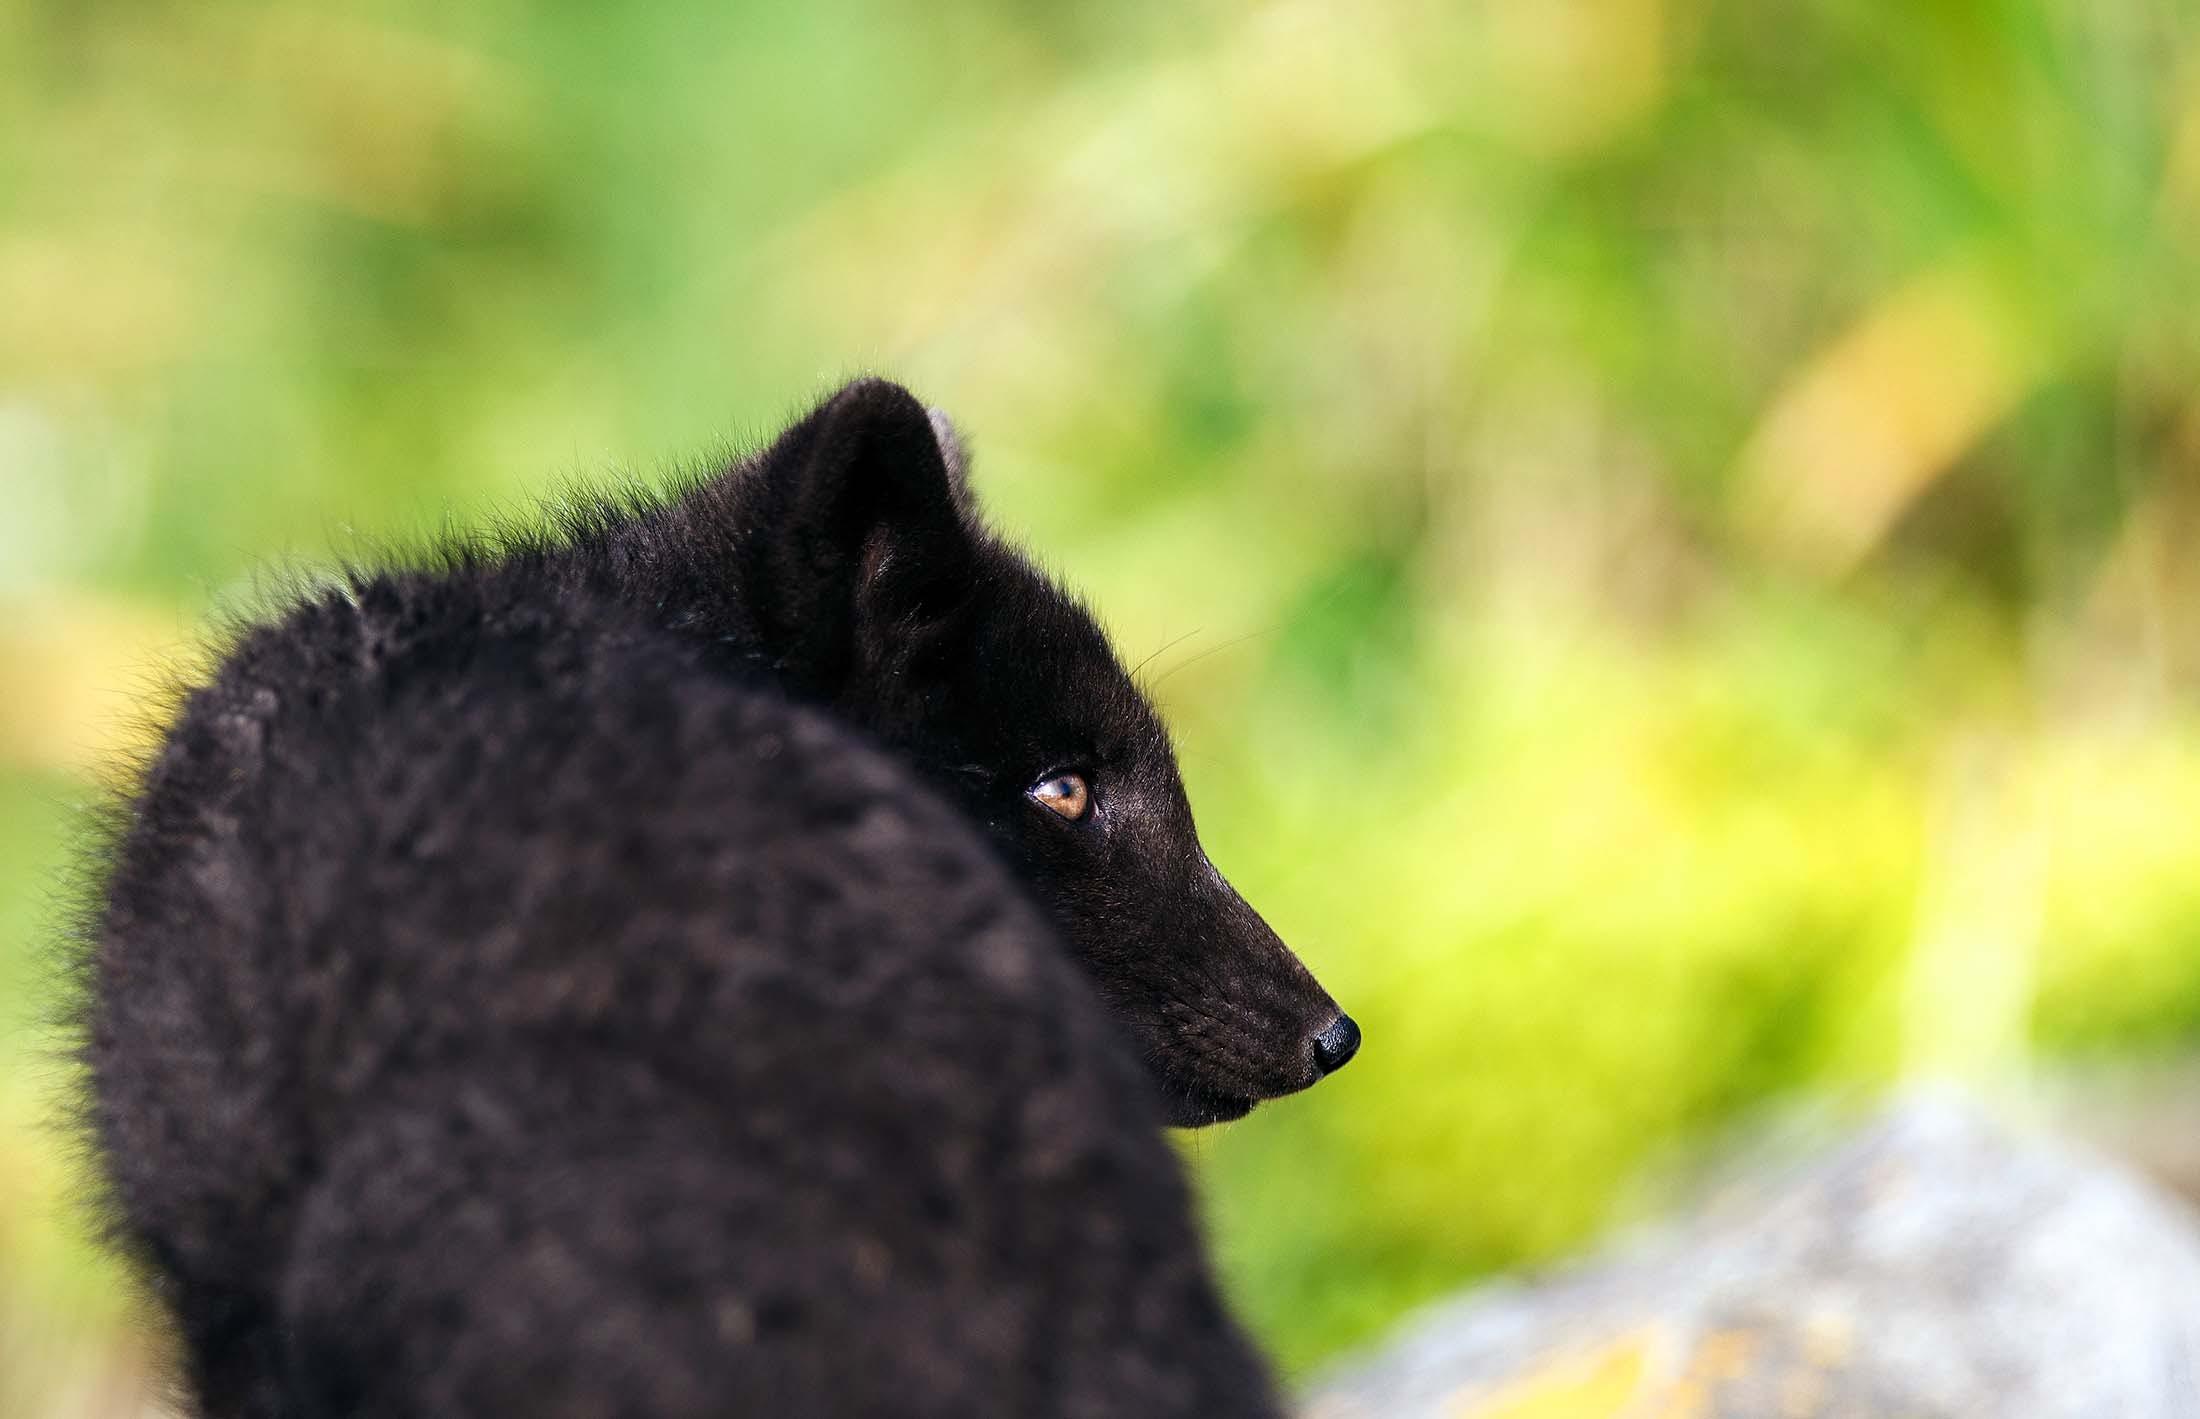 Arctic fox on Yankicha Island, Russian Far East